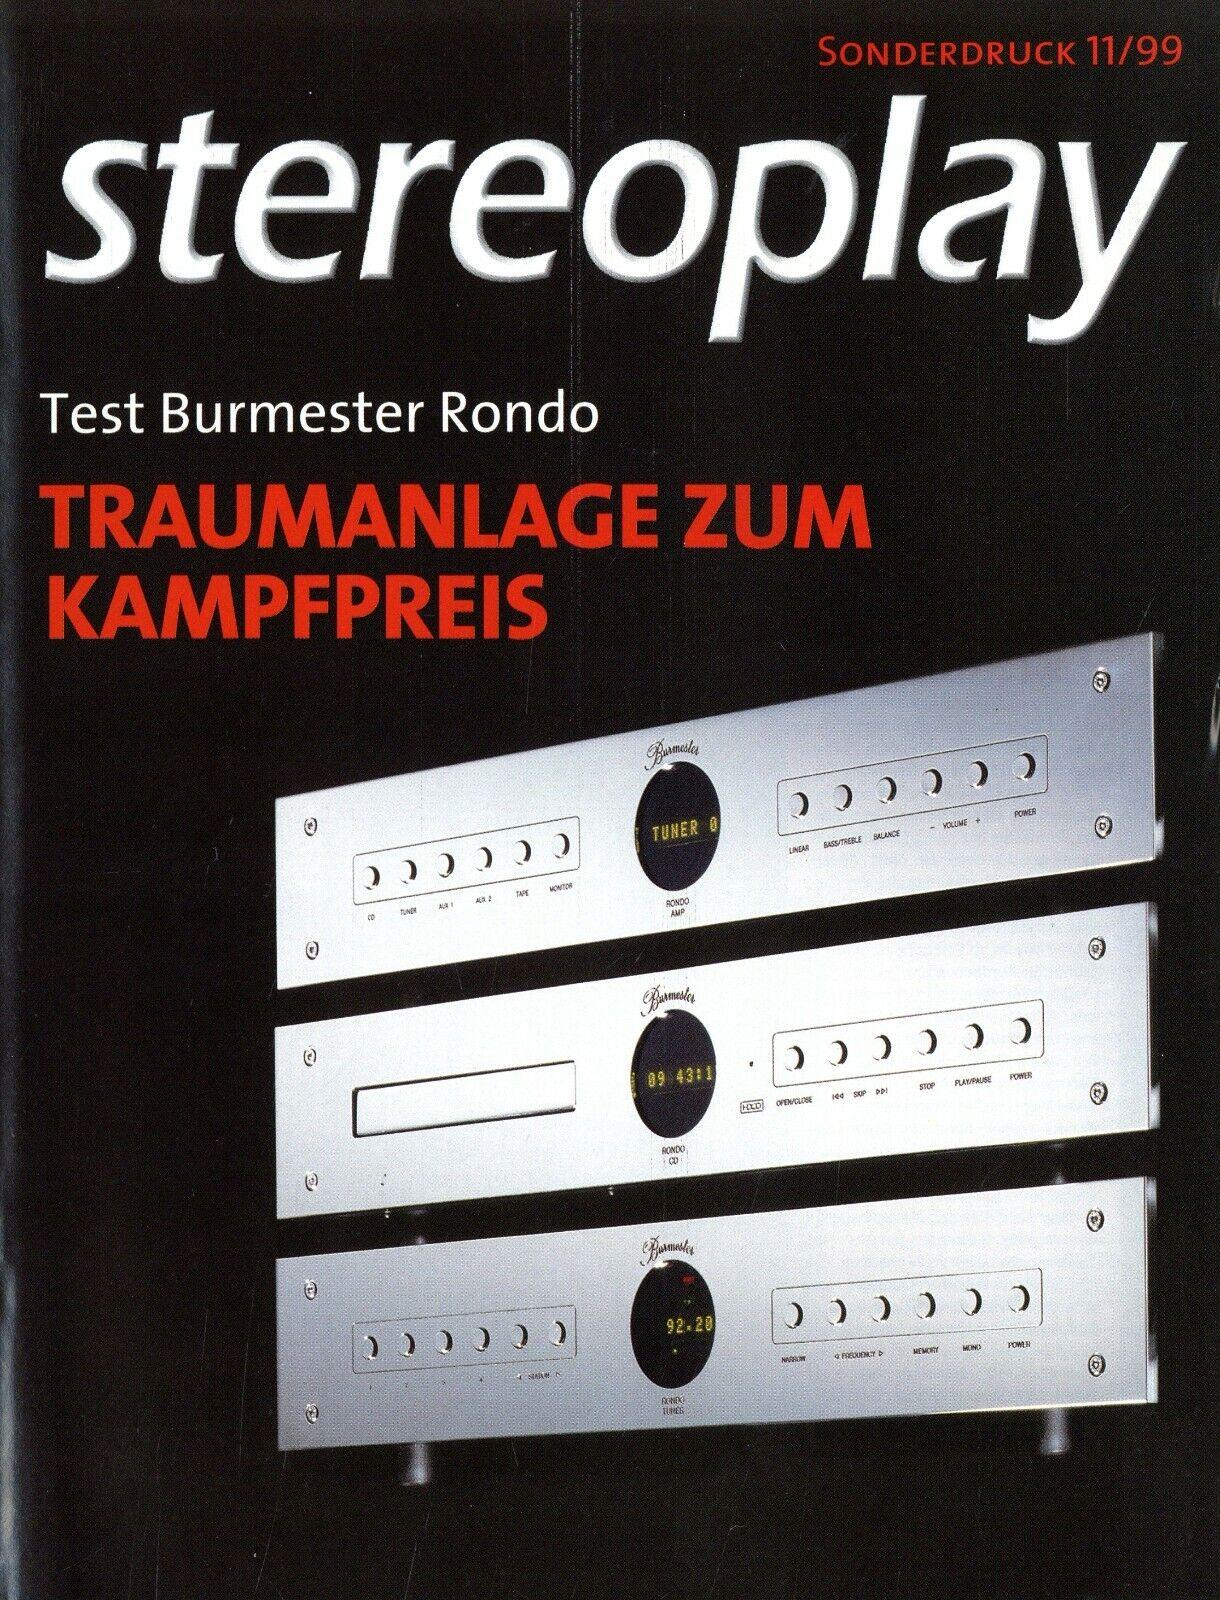 Burmester Rondo HiFi Anlage Test im Sonderdruck Stereoplay 1999 11/99 reprint